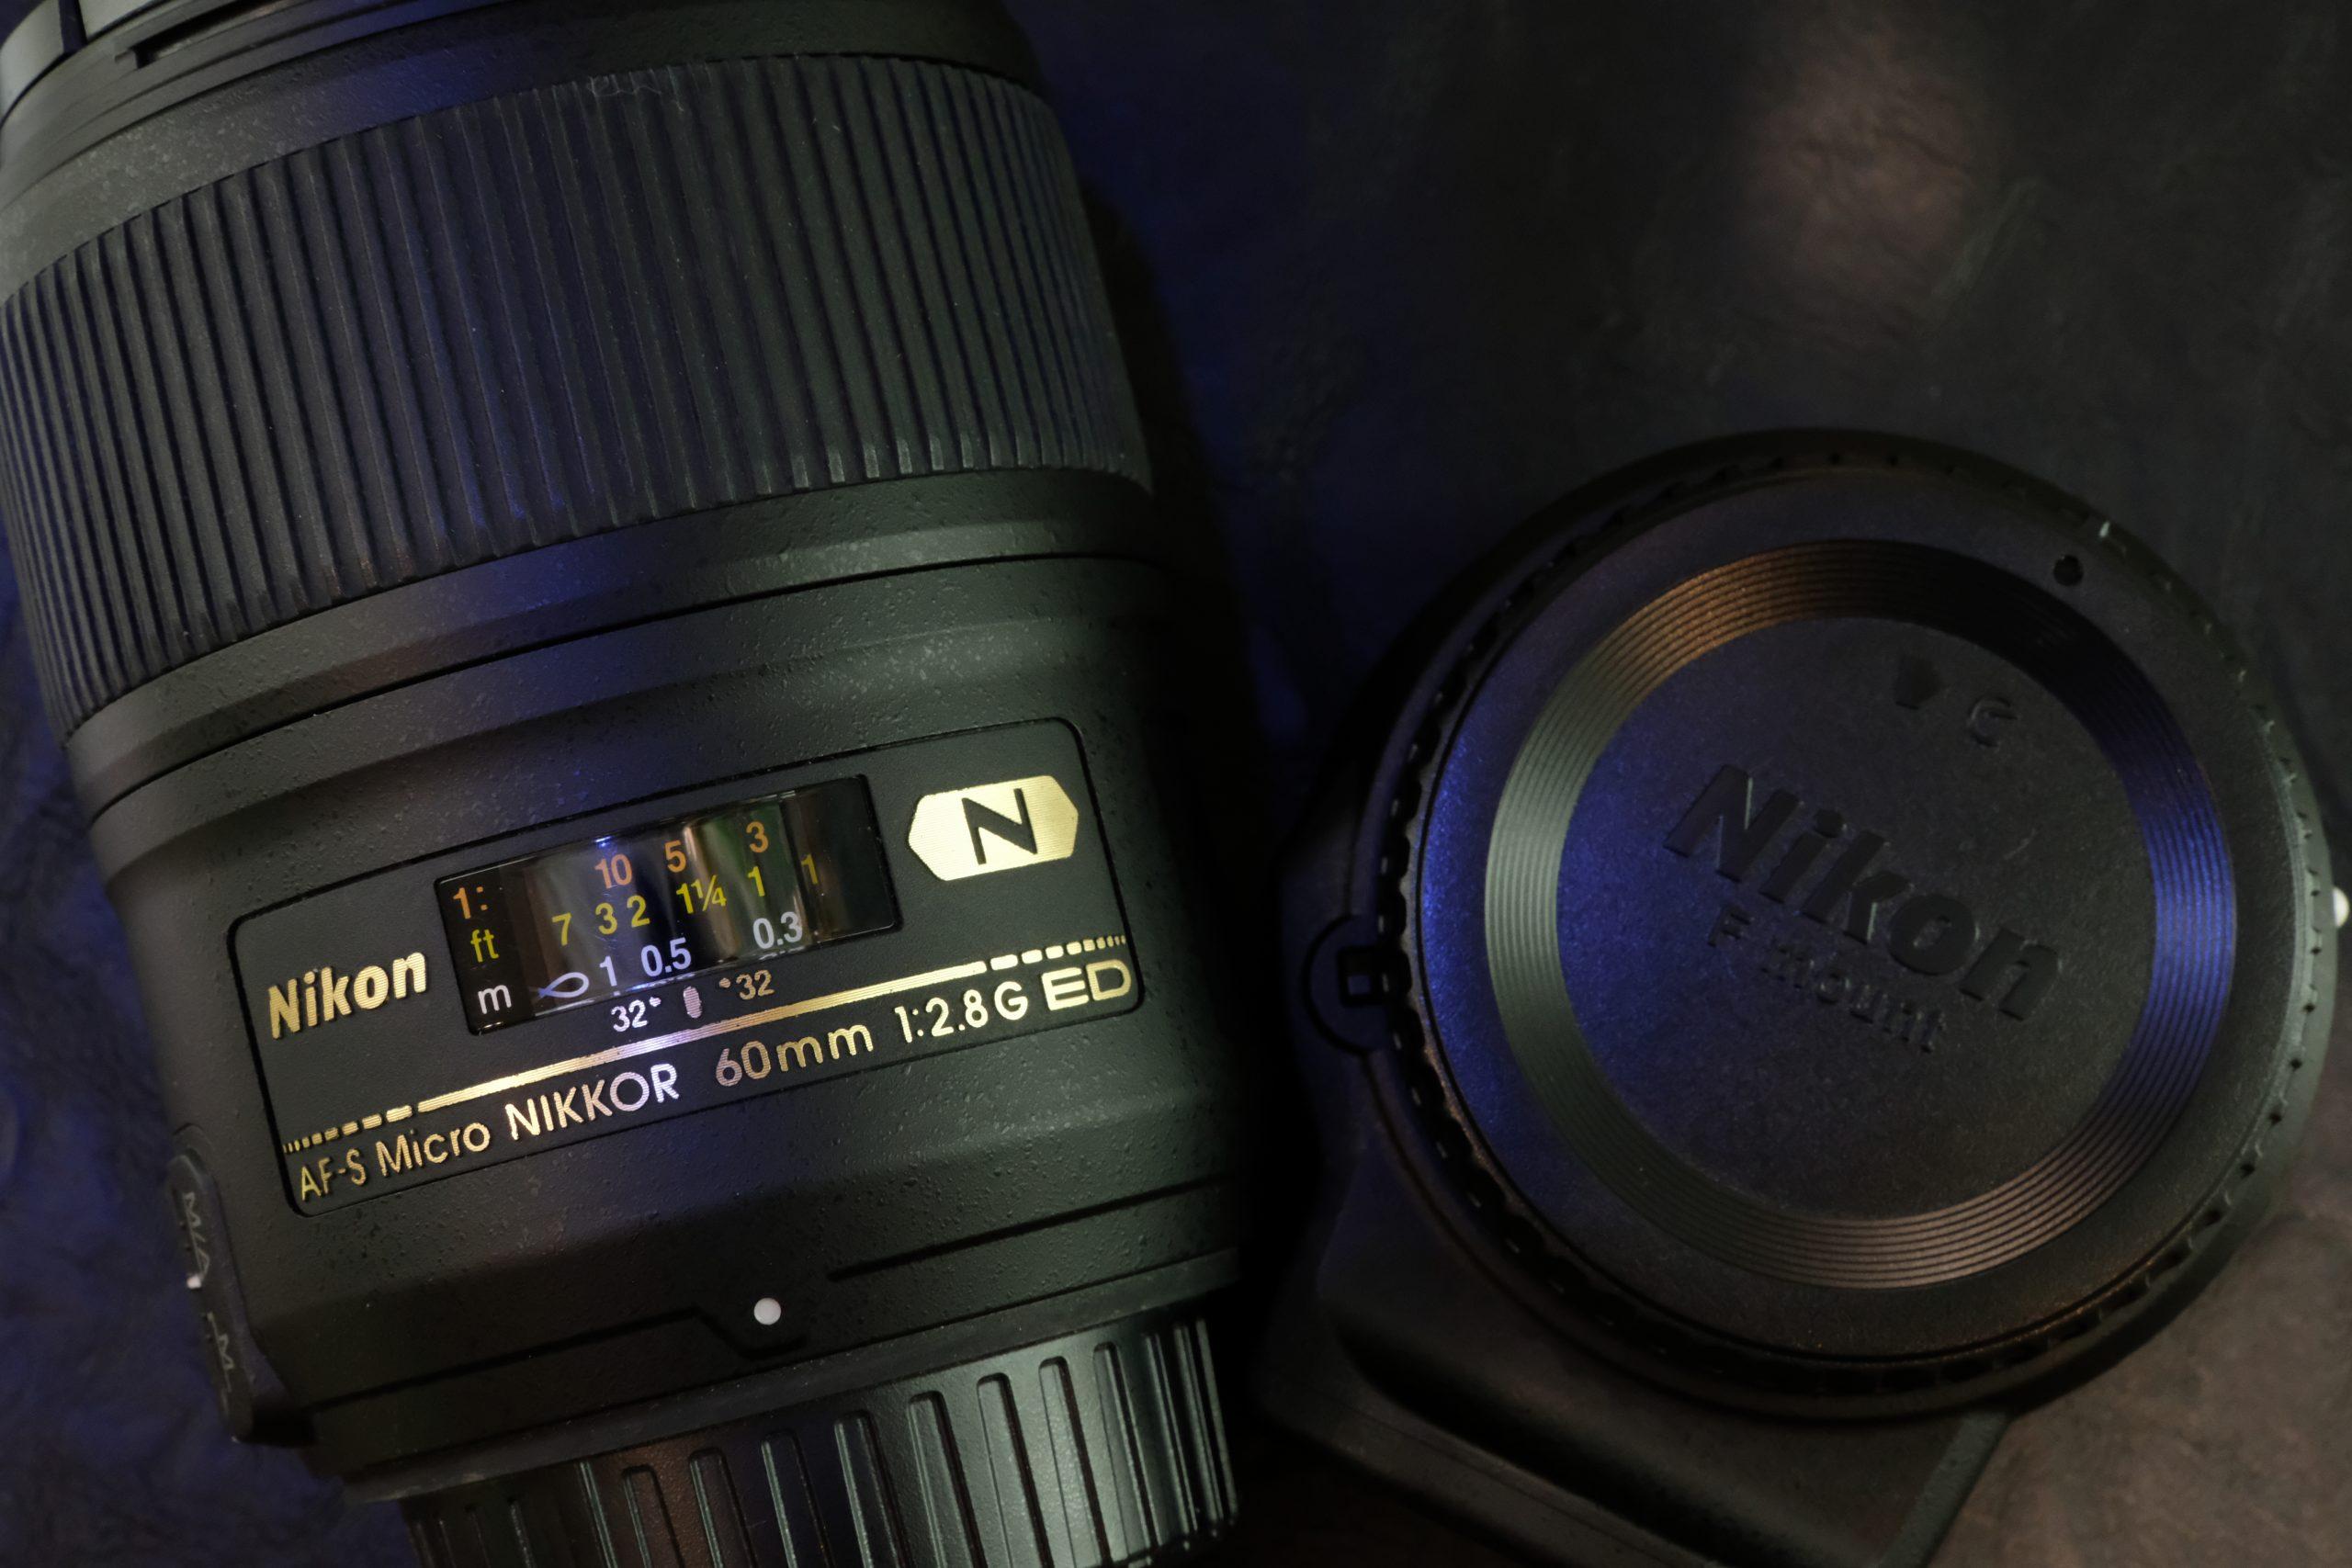 【Nikon】『Z5 × FTZの世界』~AF-S Micro NIKKOR 60mm F2.8 G ED~